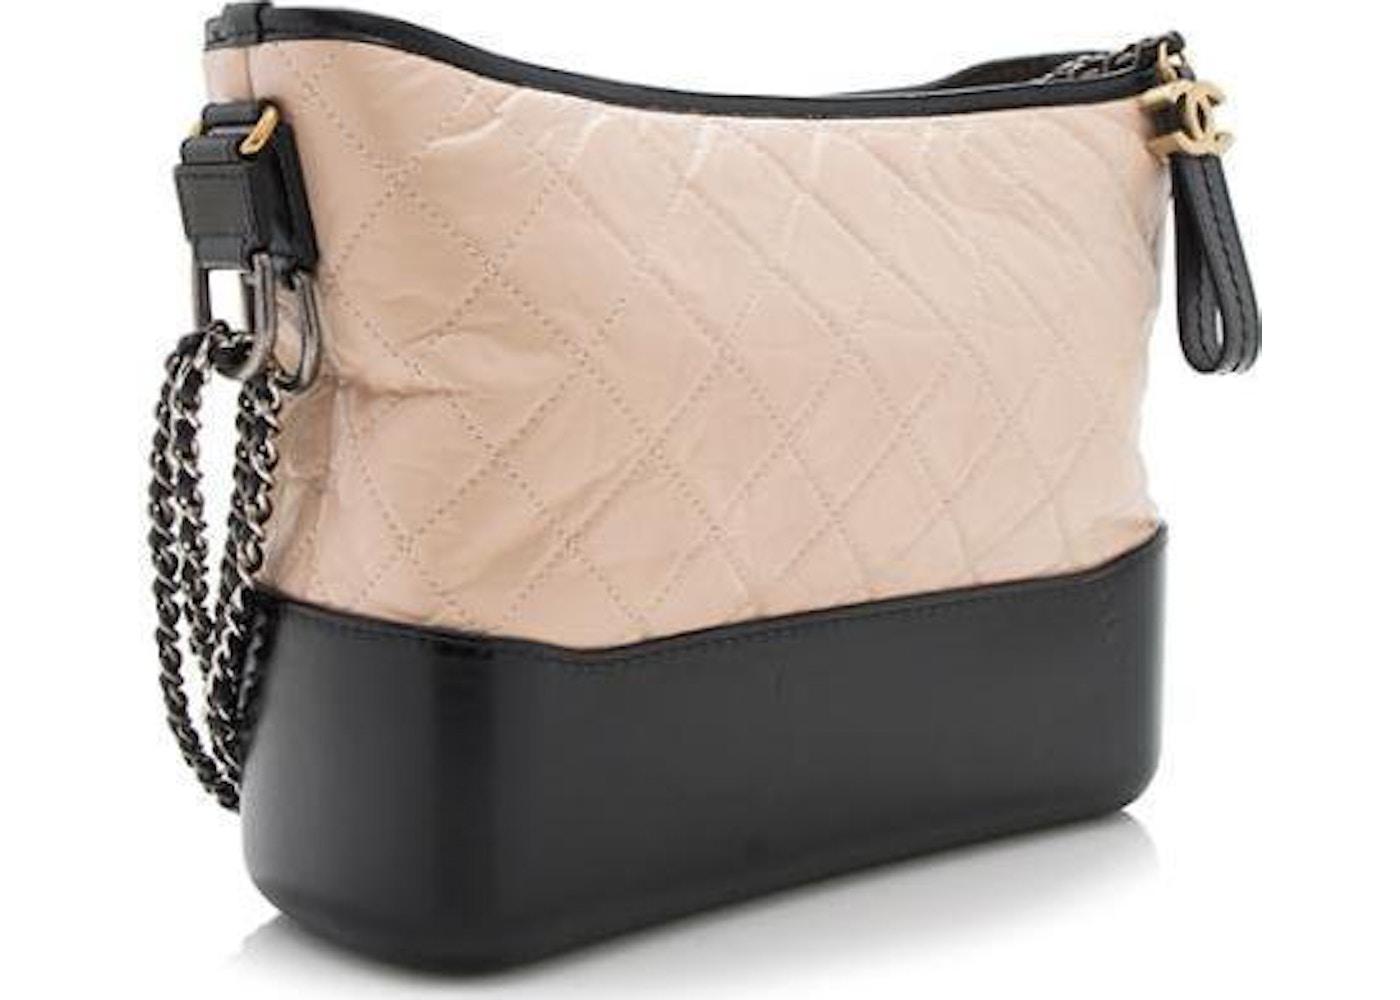 162b0157a4c1 Chanel Gabrielle Hobo Diamond Gabrielle Quilted Medium Beige/Black